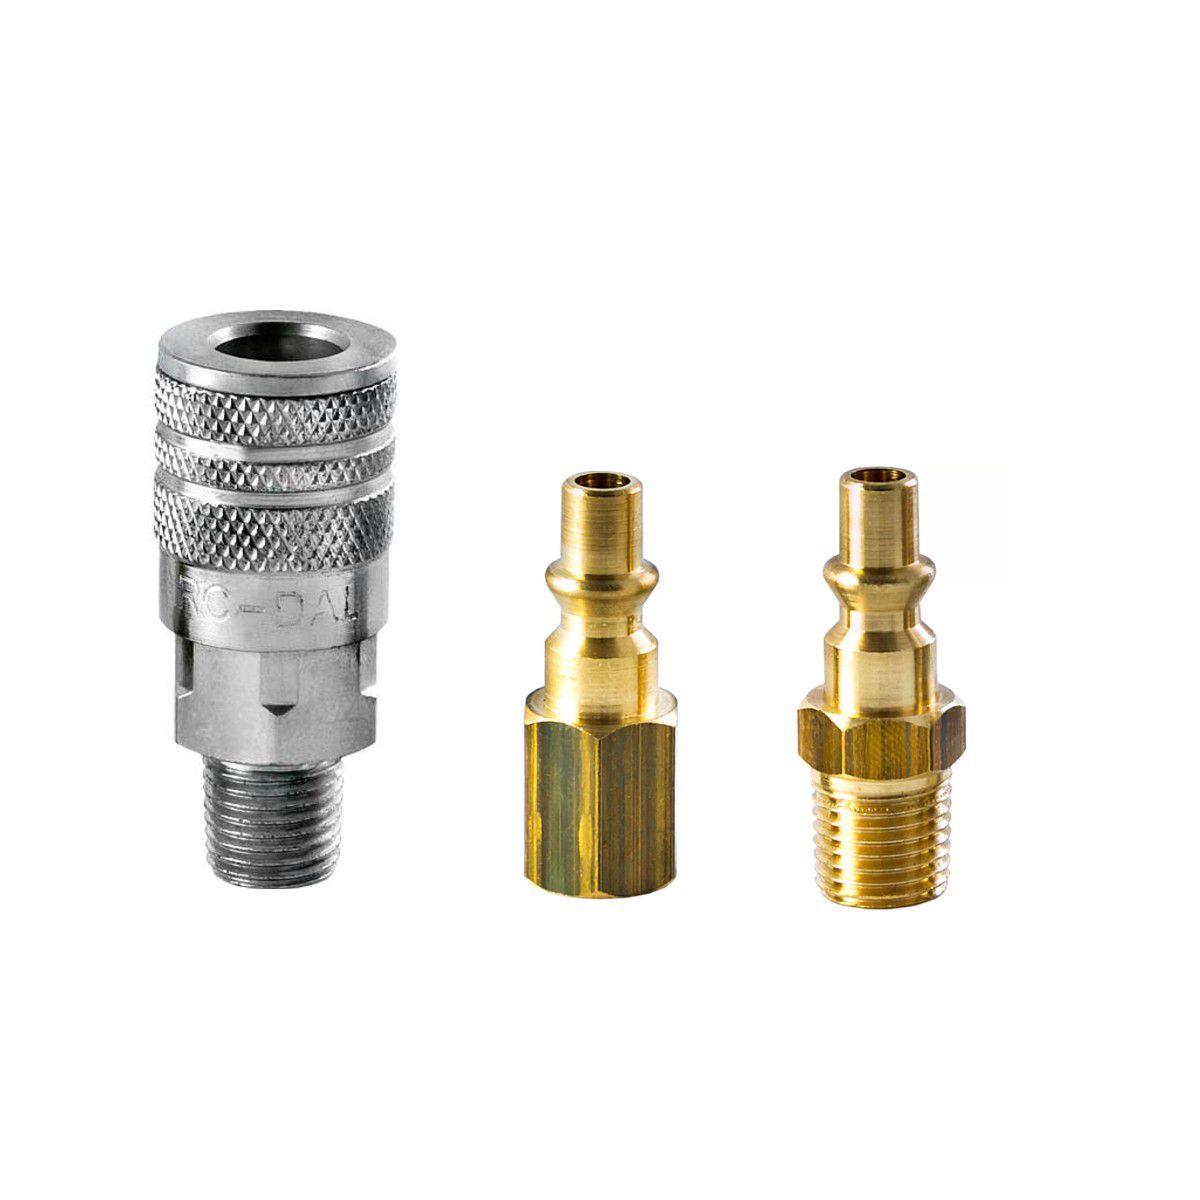 Kit Engate Rápido + Mangueira Ar Compressor 5/16 X 25 Mt